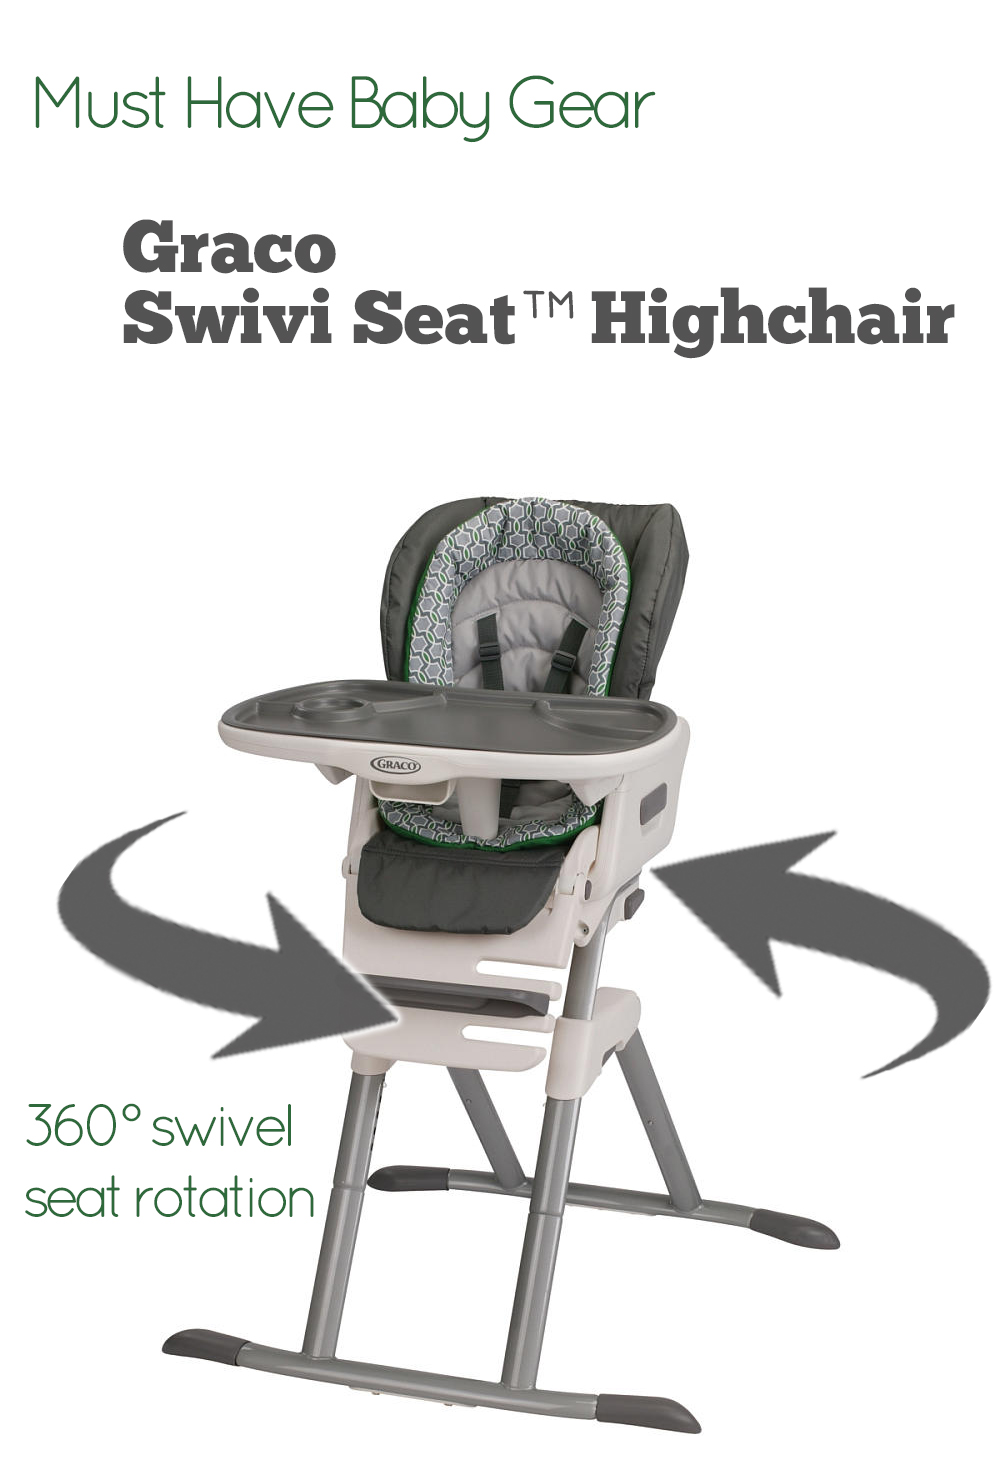 Graco® Swivi Seat™ Highchair